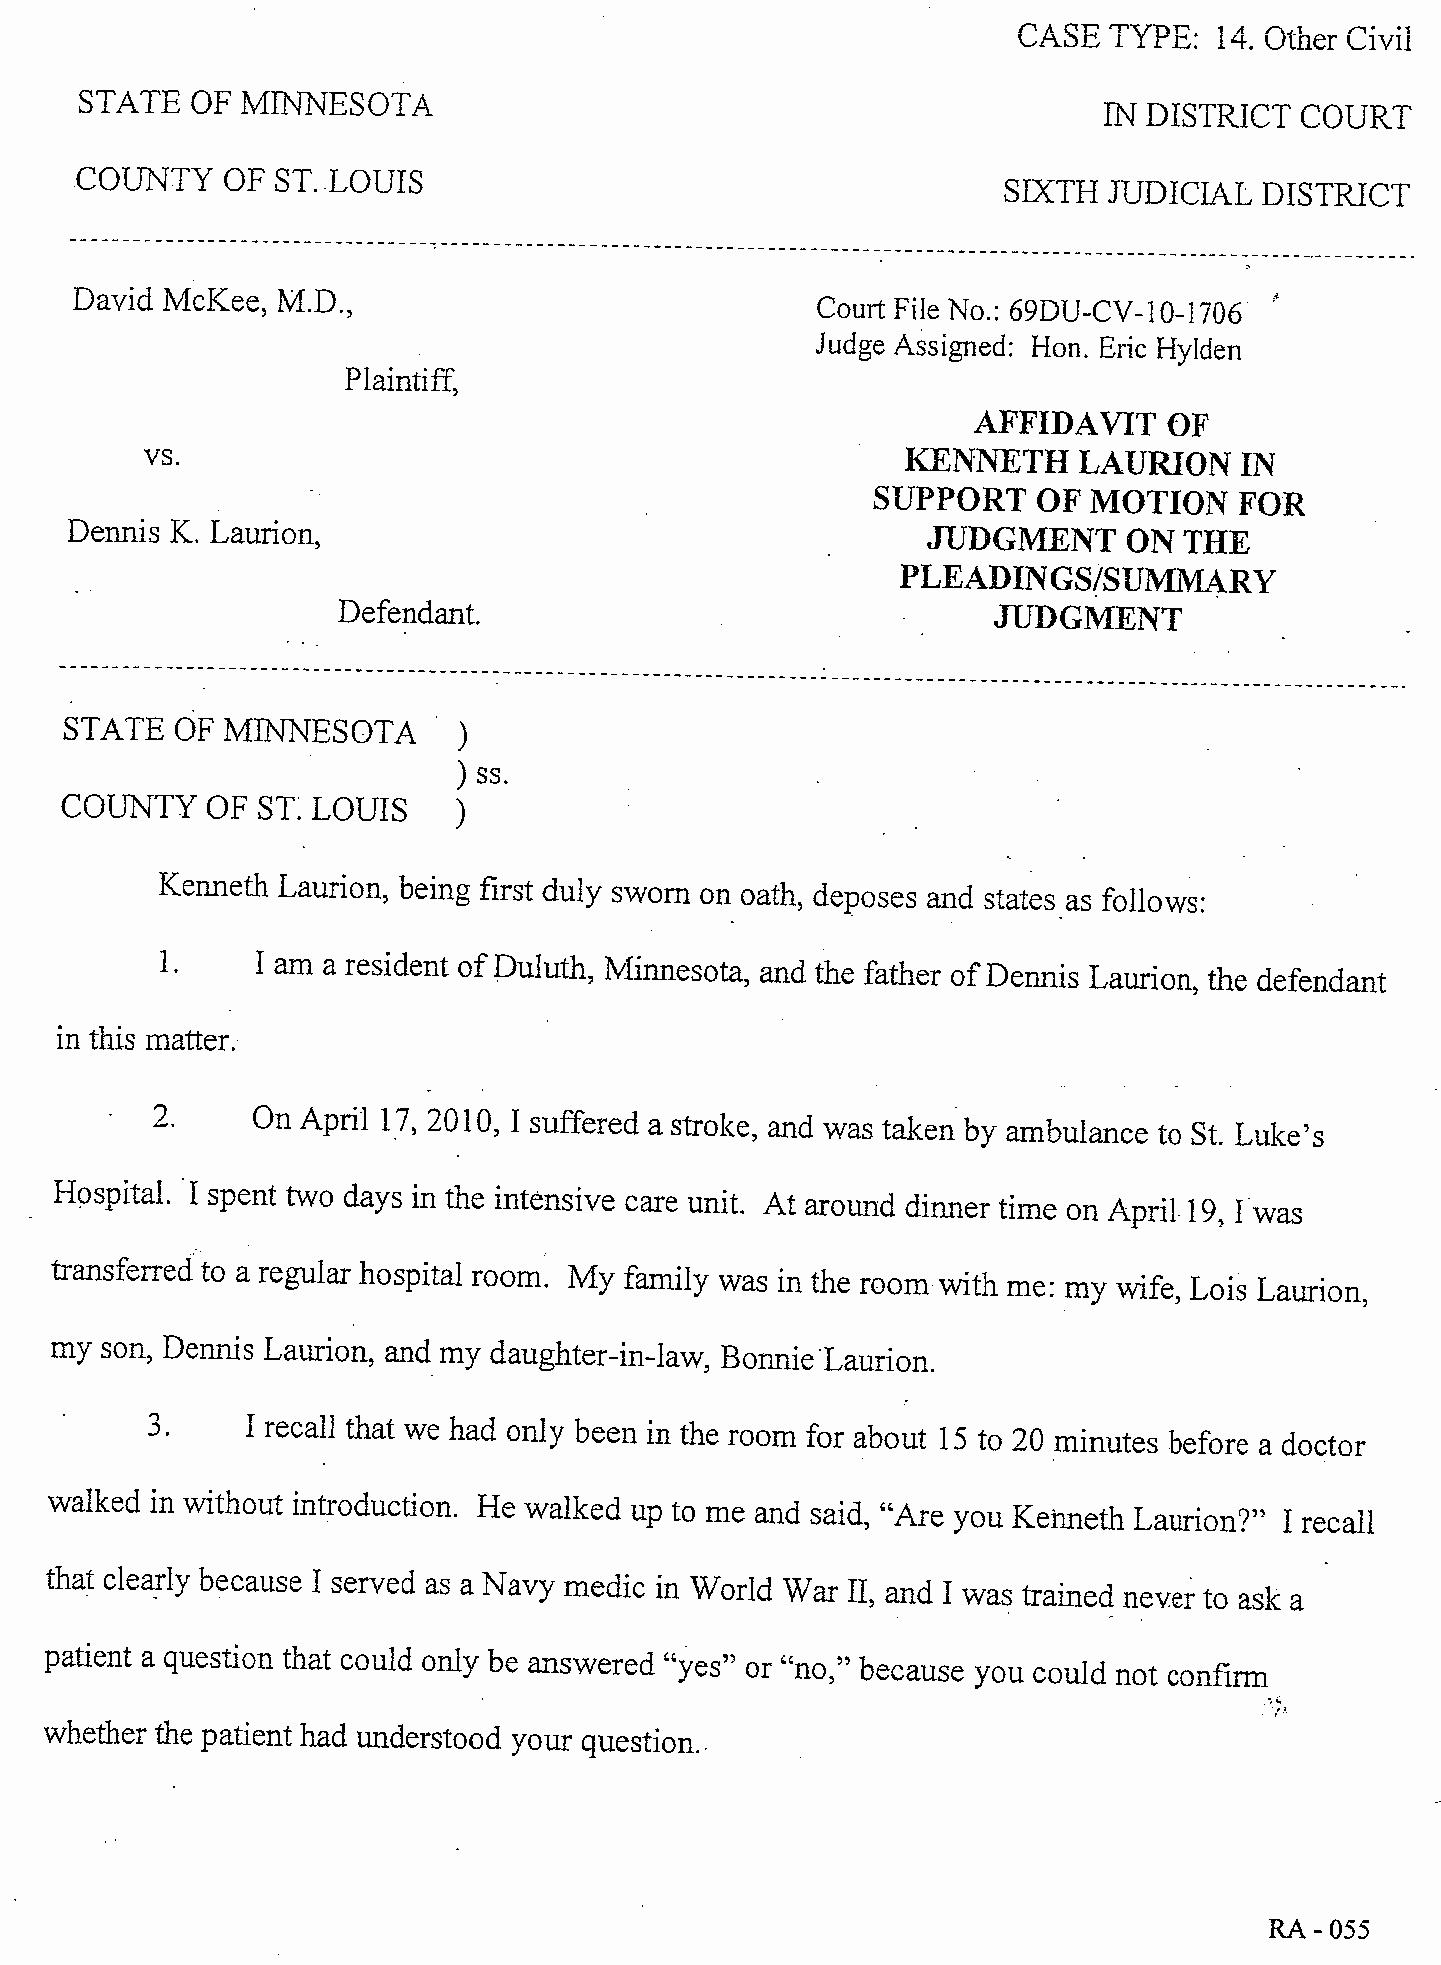 Affidavit Of assignment Fresh assignment Judgment On the Pleadings Maybankperdanntest